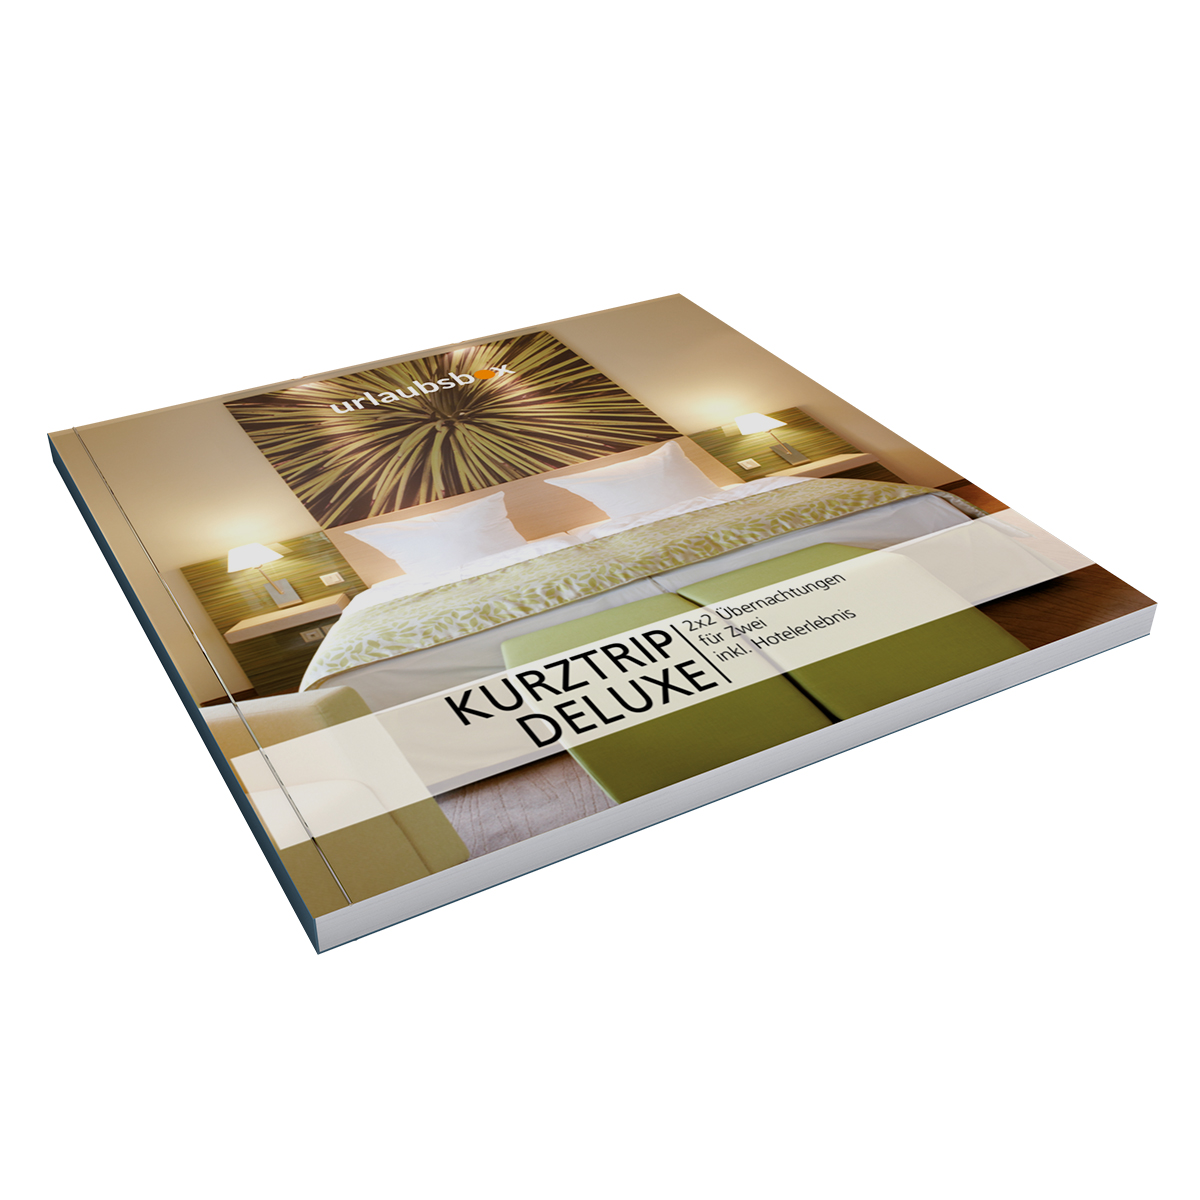 Kurztrip Deluxe - Hotelgutschein - 4